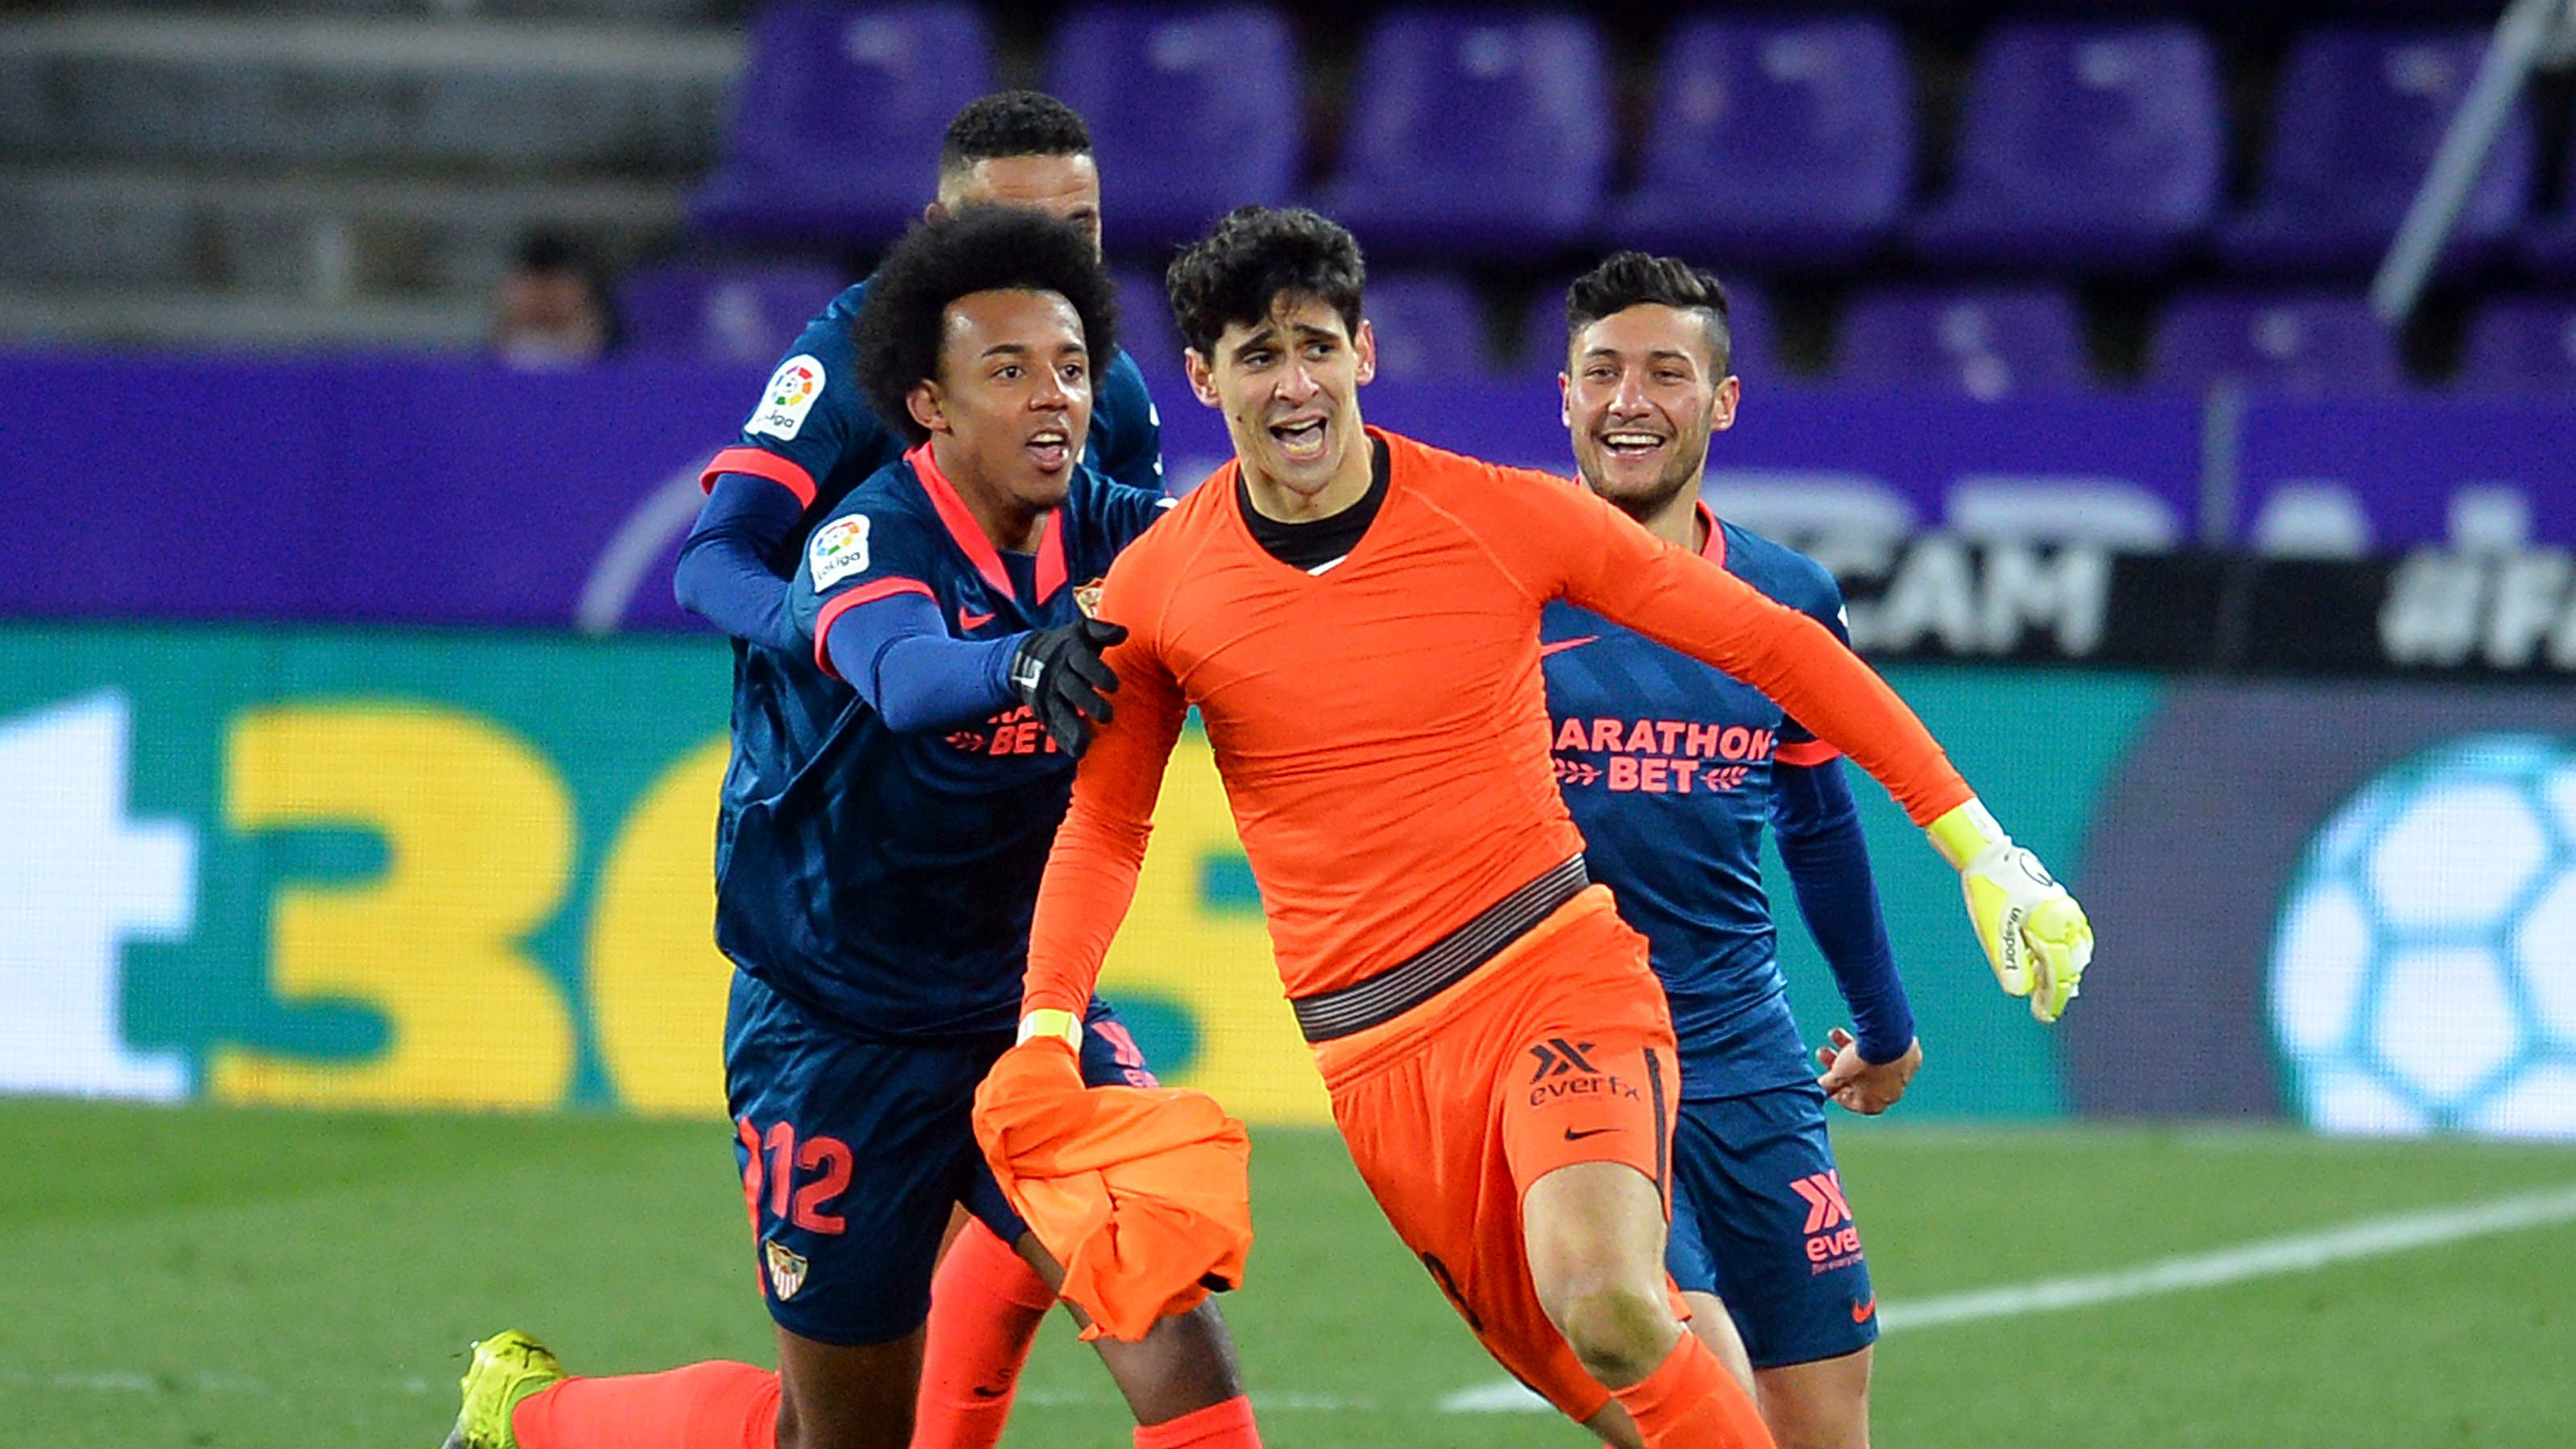 WATCH: Sevilla GOALKEEPER Bono nets sensational equaliser at Real  Valladolid - Football Espana